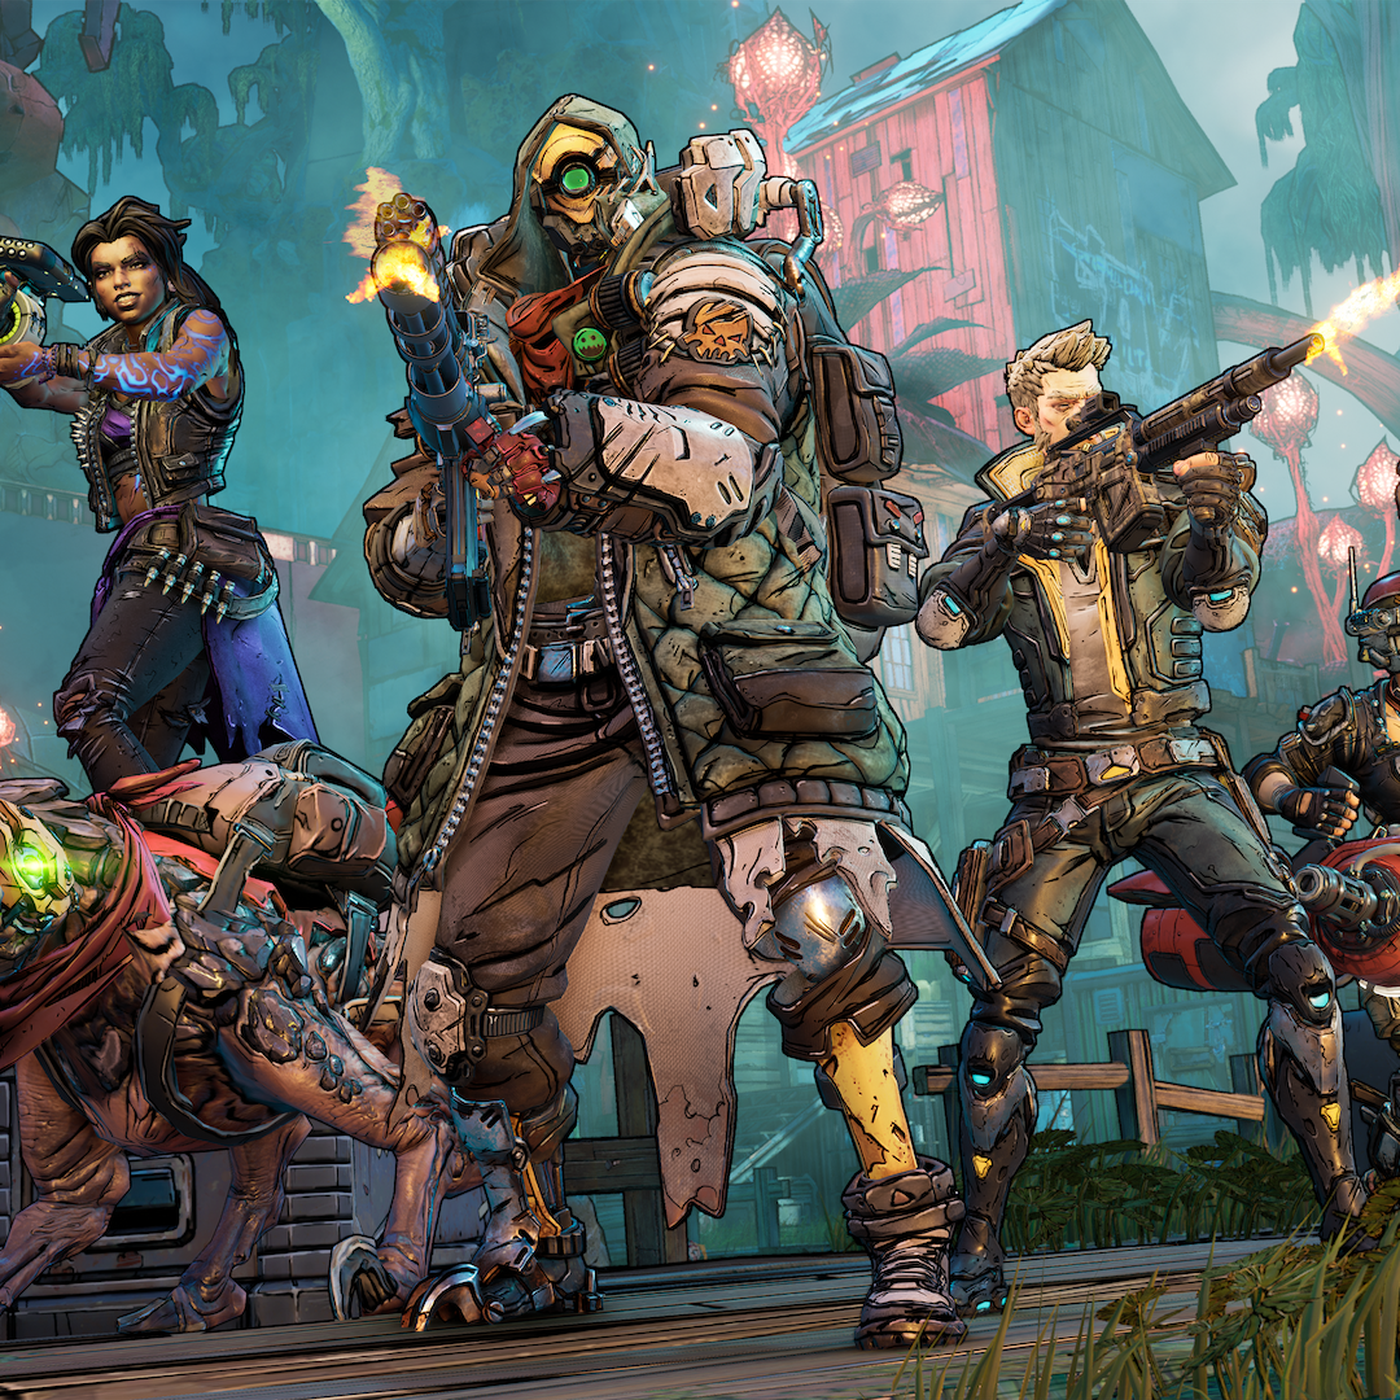 Borderlands 3 Pc Gamers Dump On The Game In Borderlands 2 S